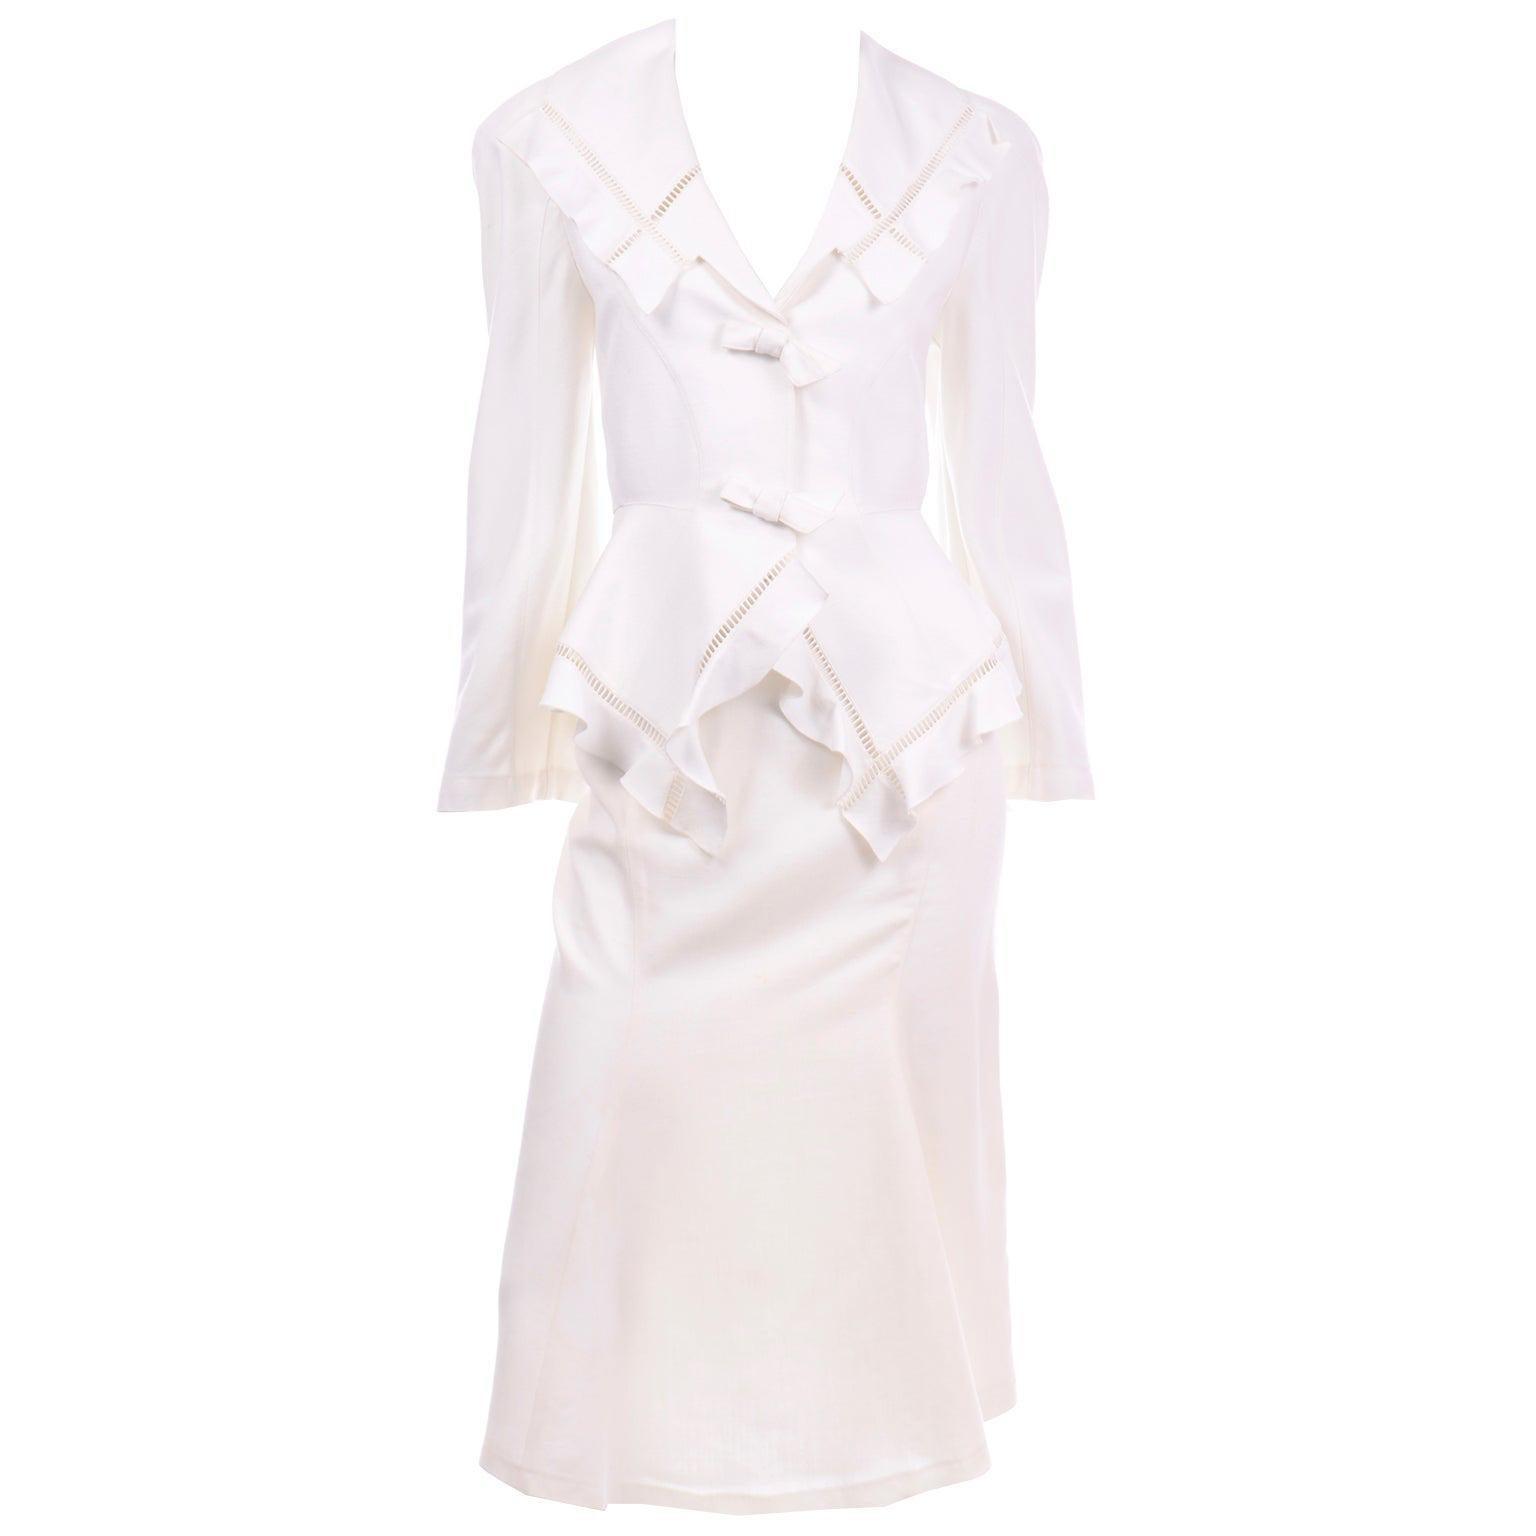 Vintage Thierry Mugler White Linen Blend Skirt & Peplum Jacket Suit With Ruffles